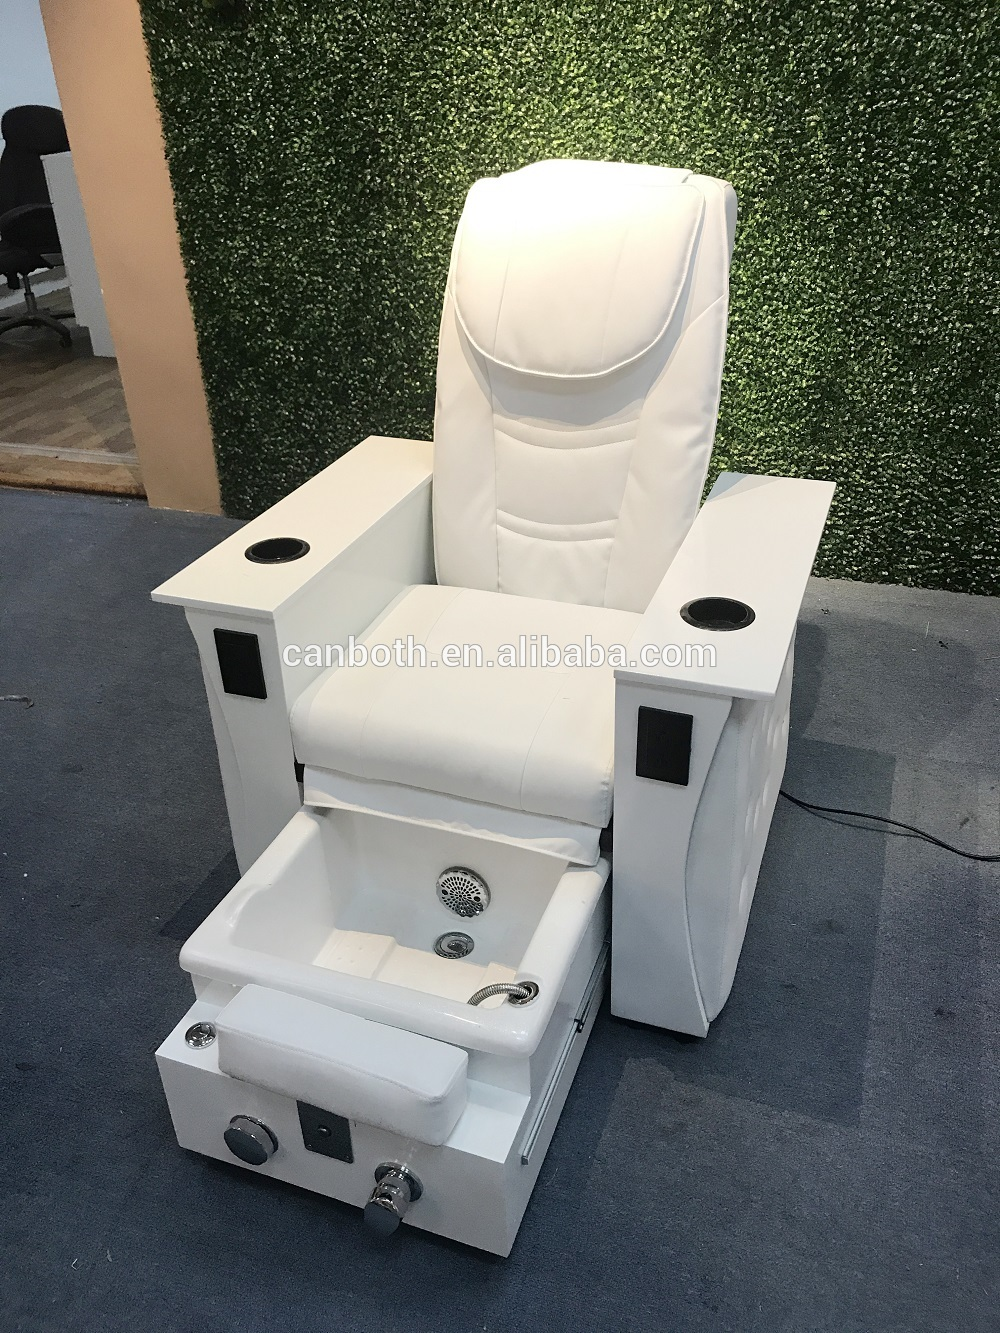 Pure White Color Salon Chair Foldable Nail Spa Pedicure Chair